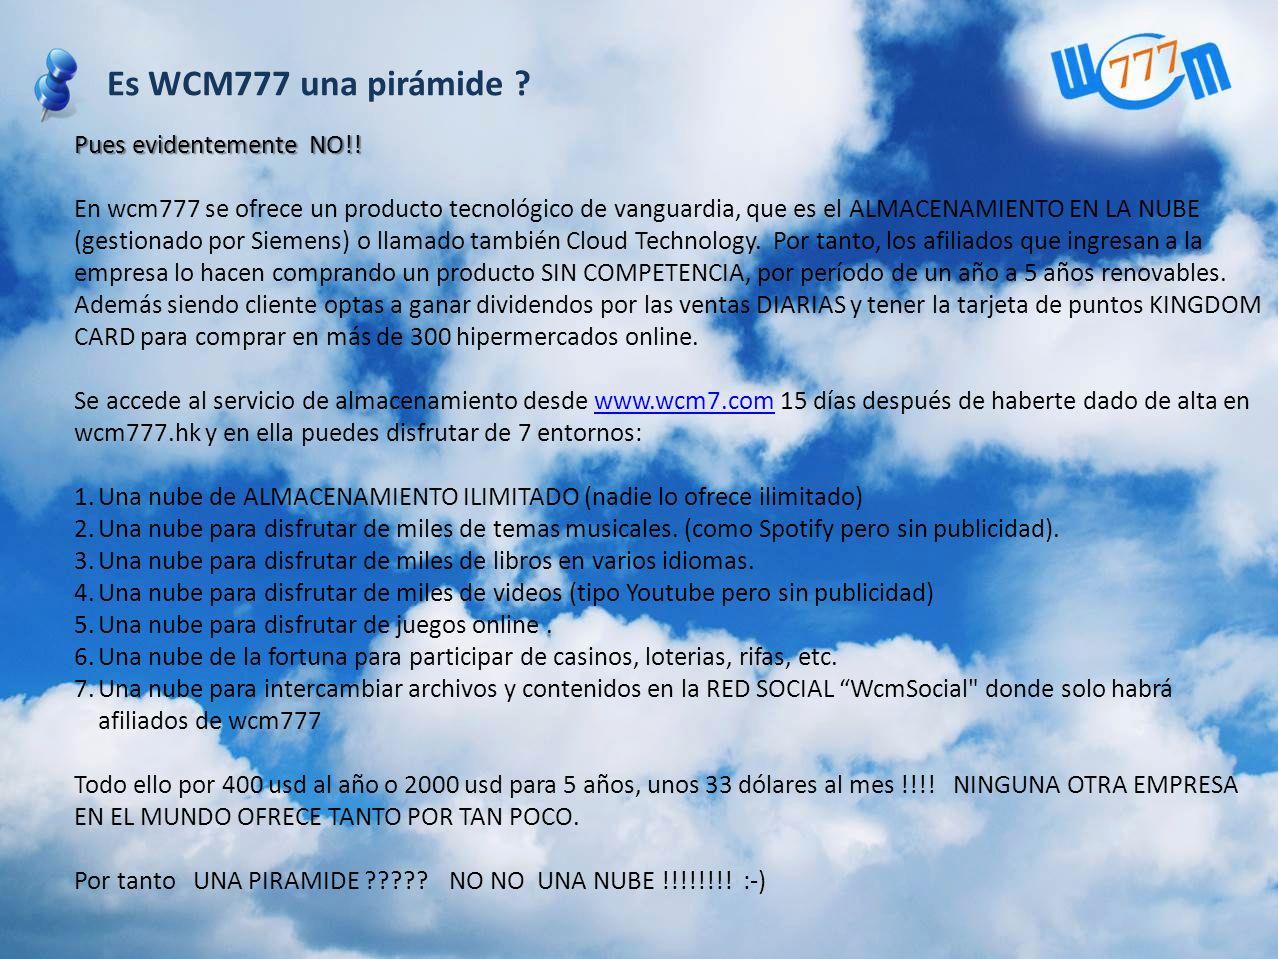 Es WCM777 una pirámide ?